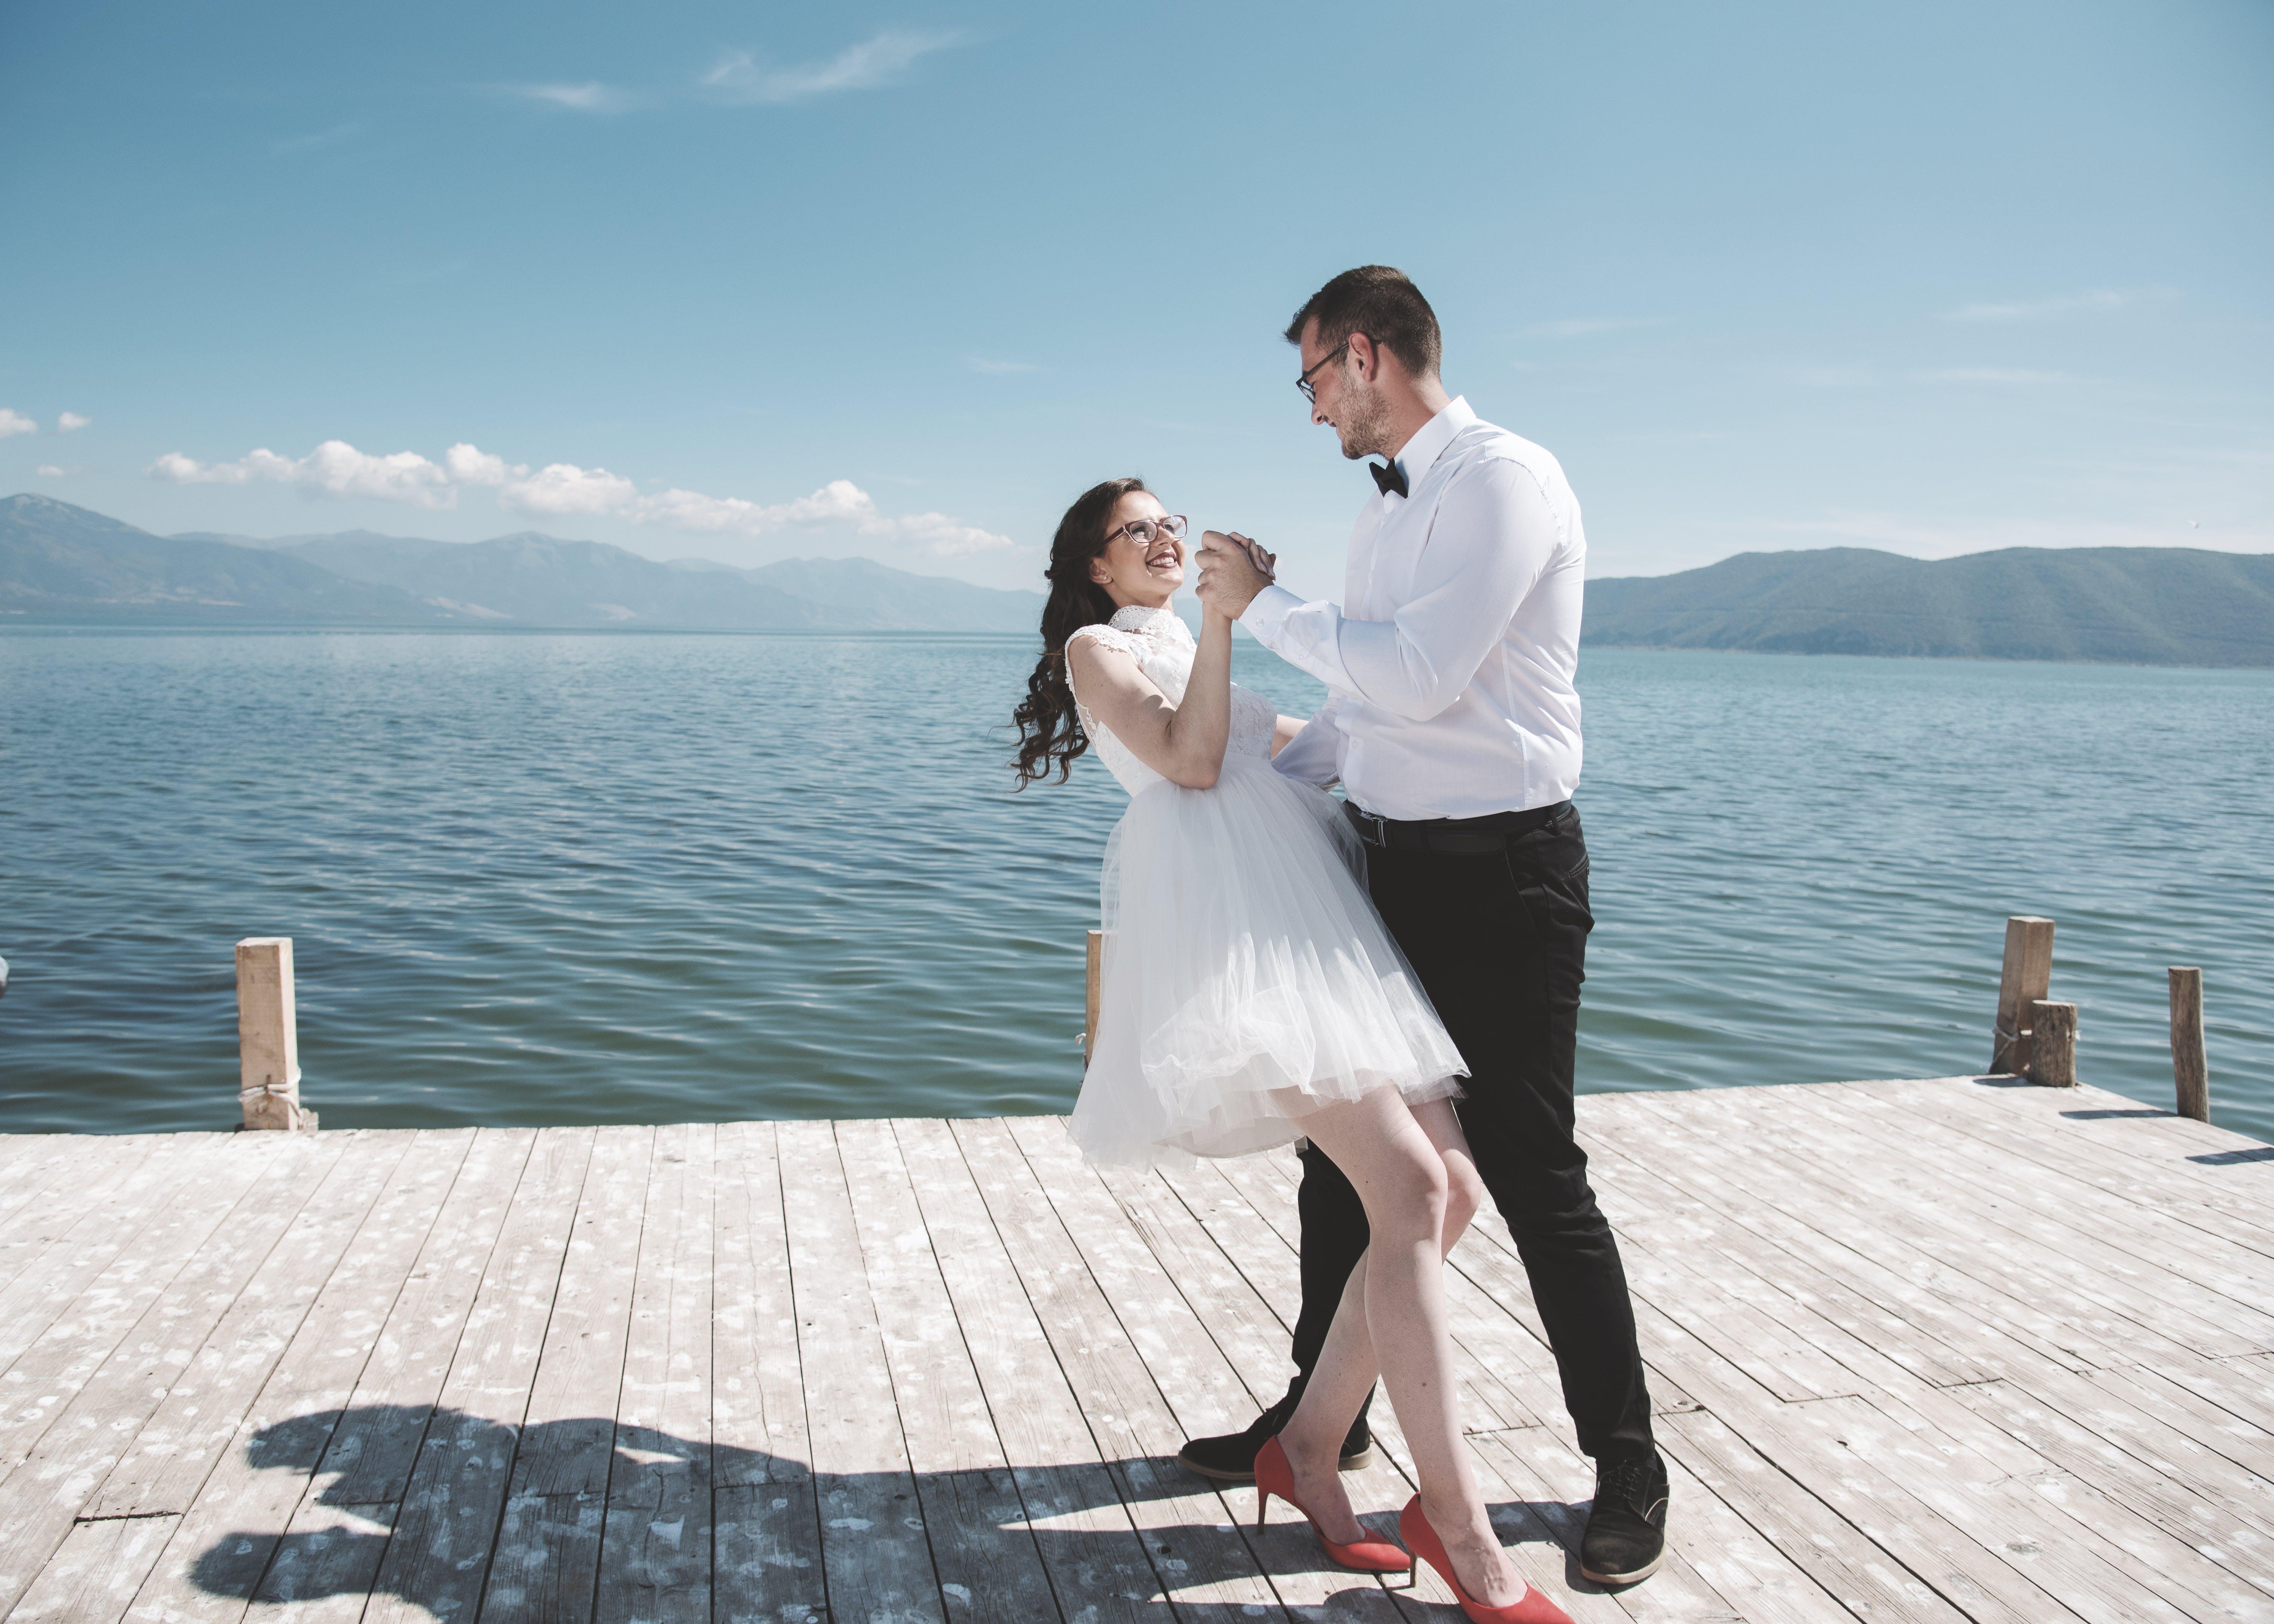 Man and Woman Dancing on Dock